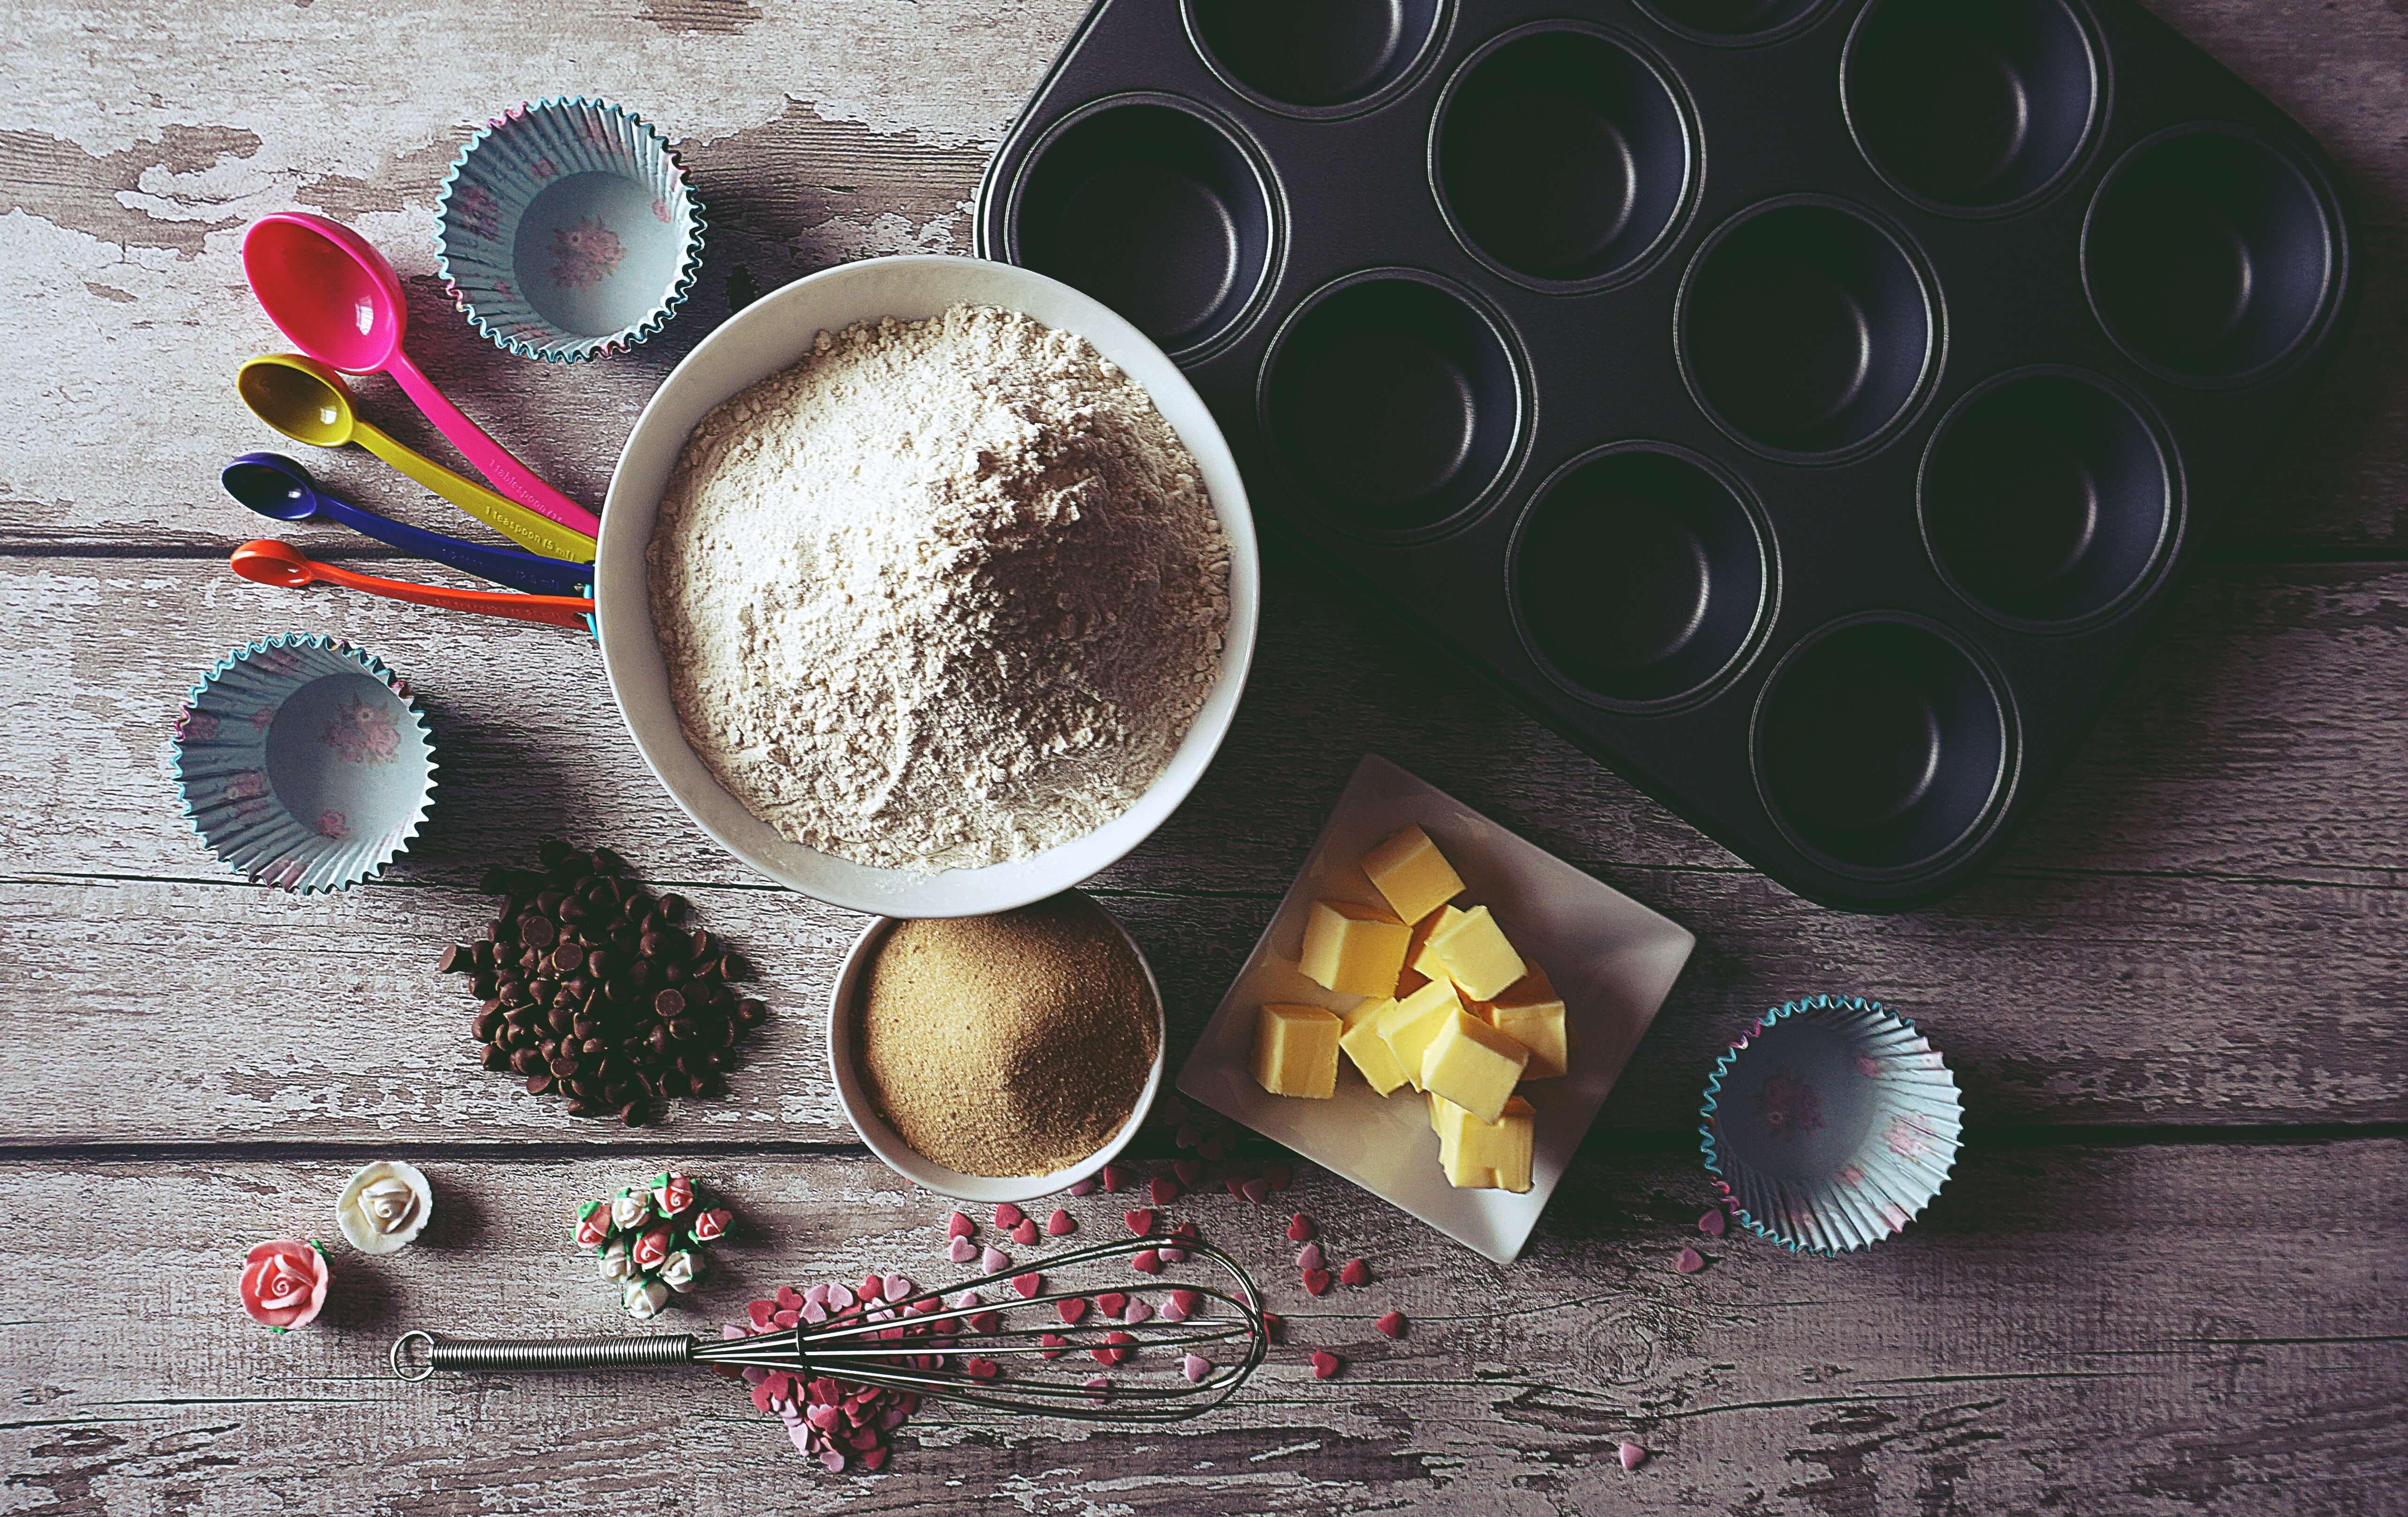 baking ingredients, activities for last days of summer